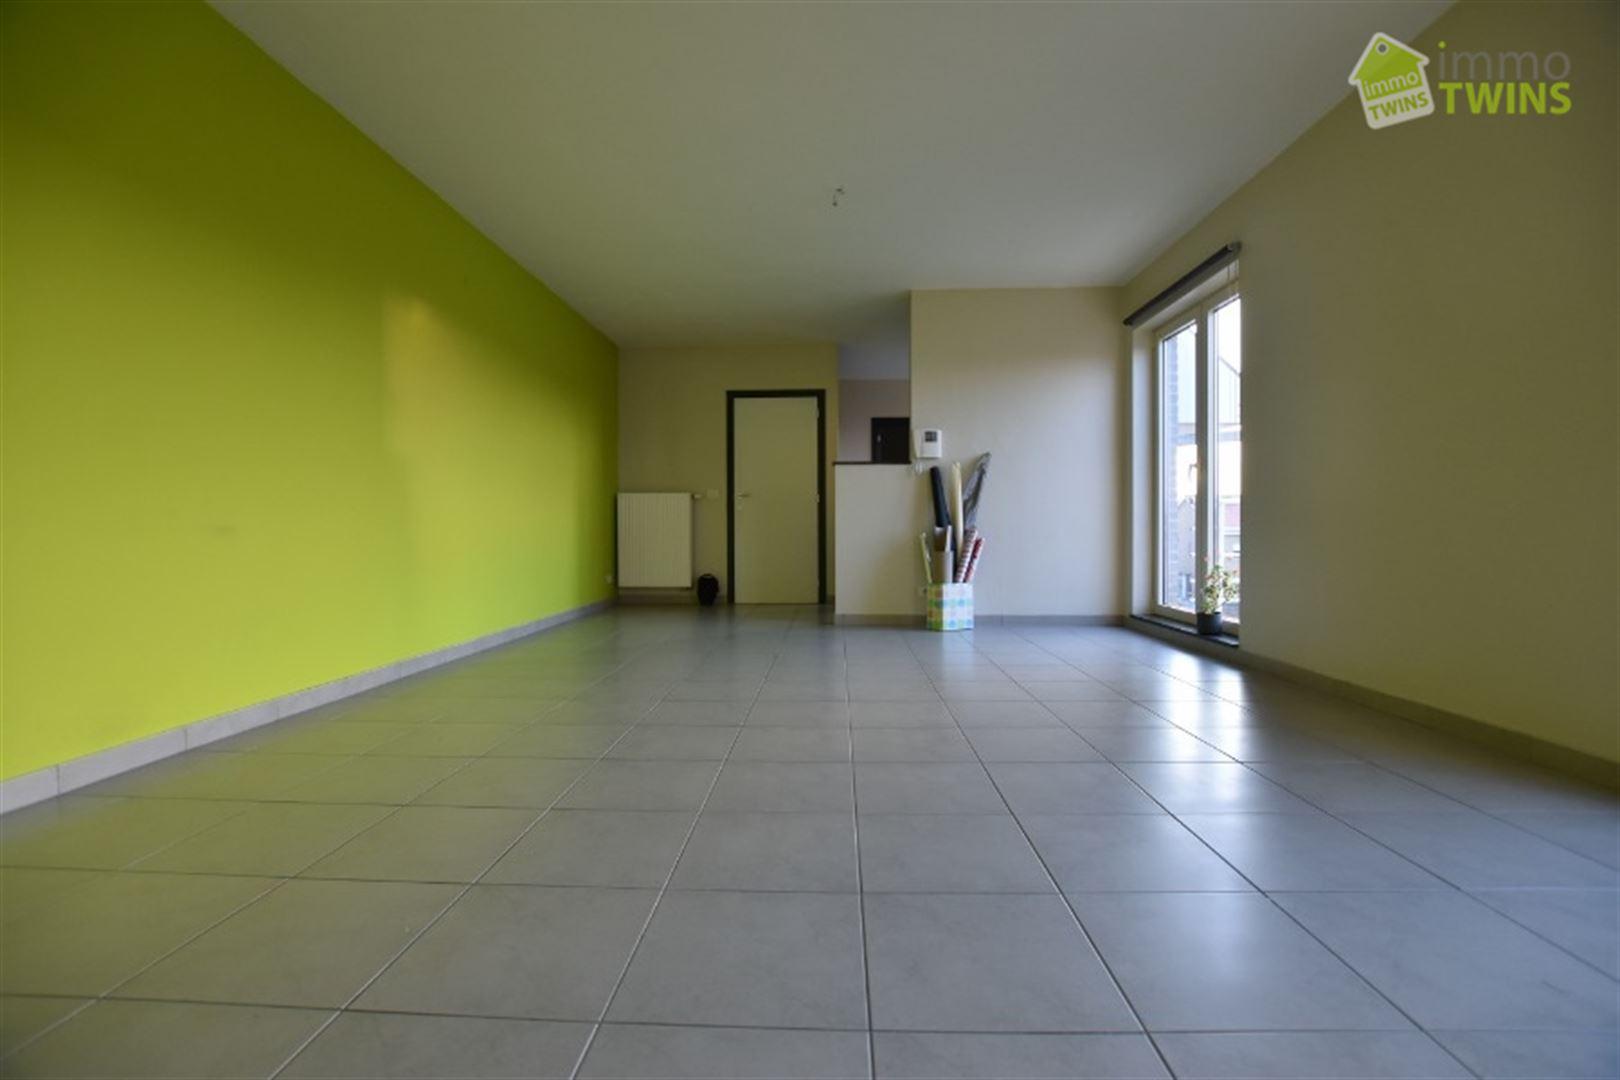 Foto 2 : Appartement te   (België) - Prijs € 590